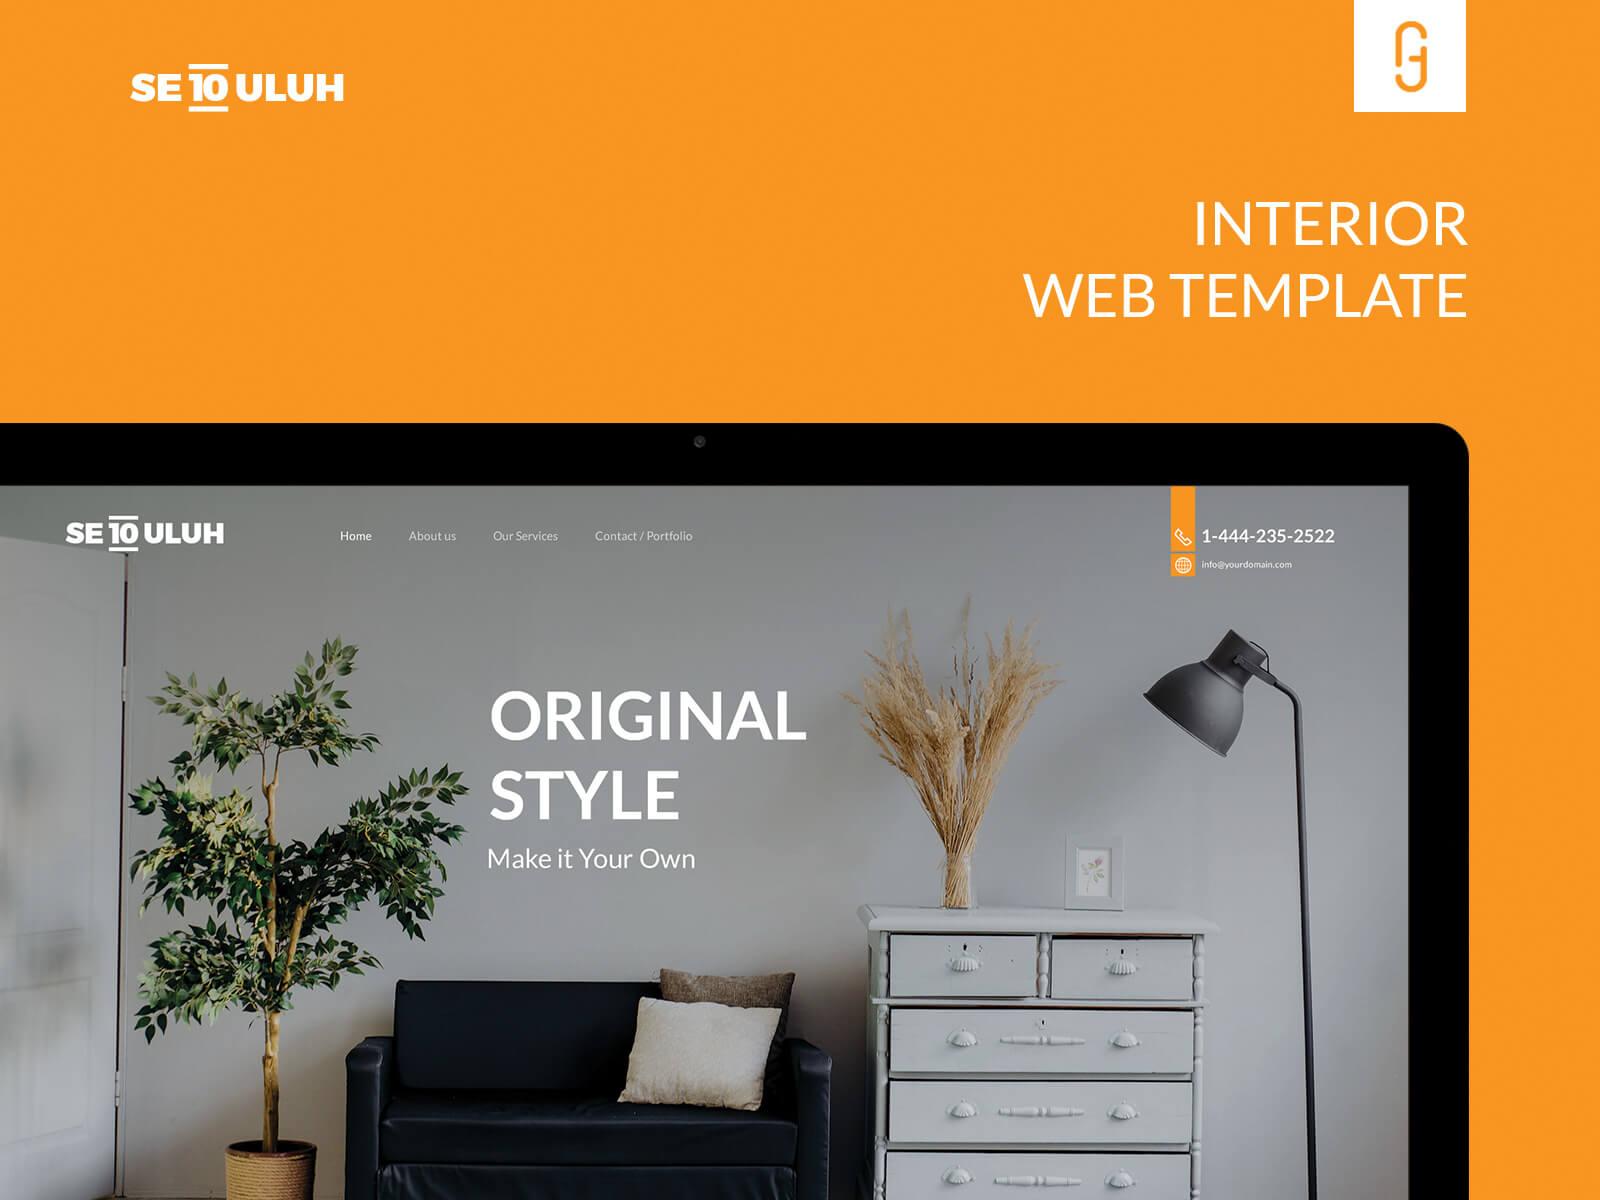 Sepuluh Interior Free Web Template cover image